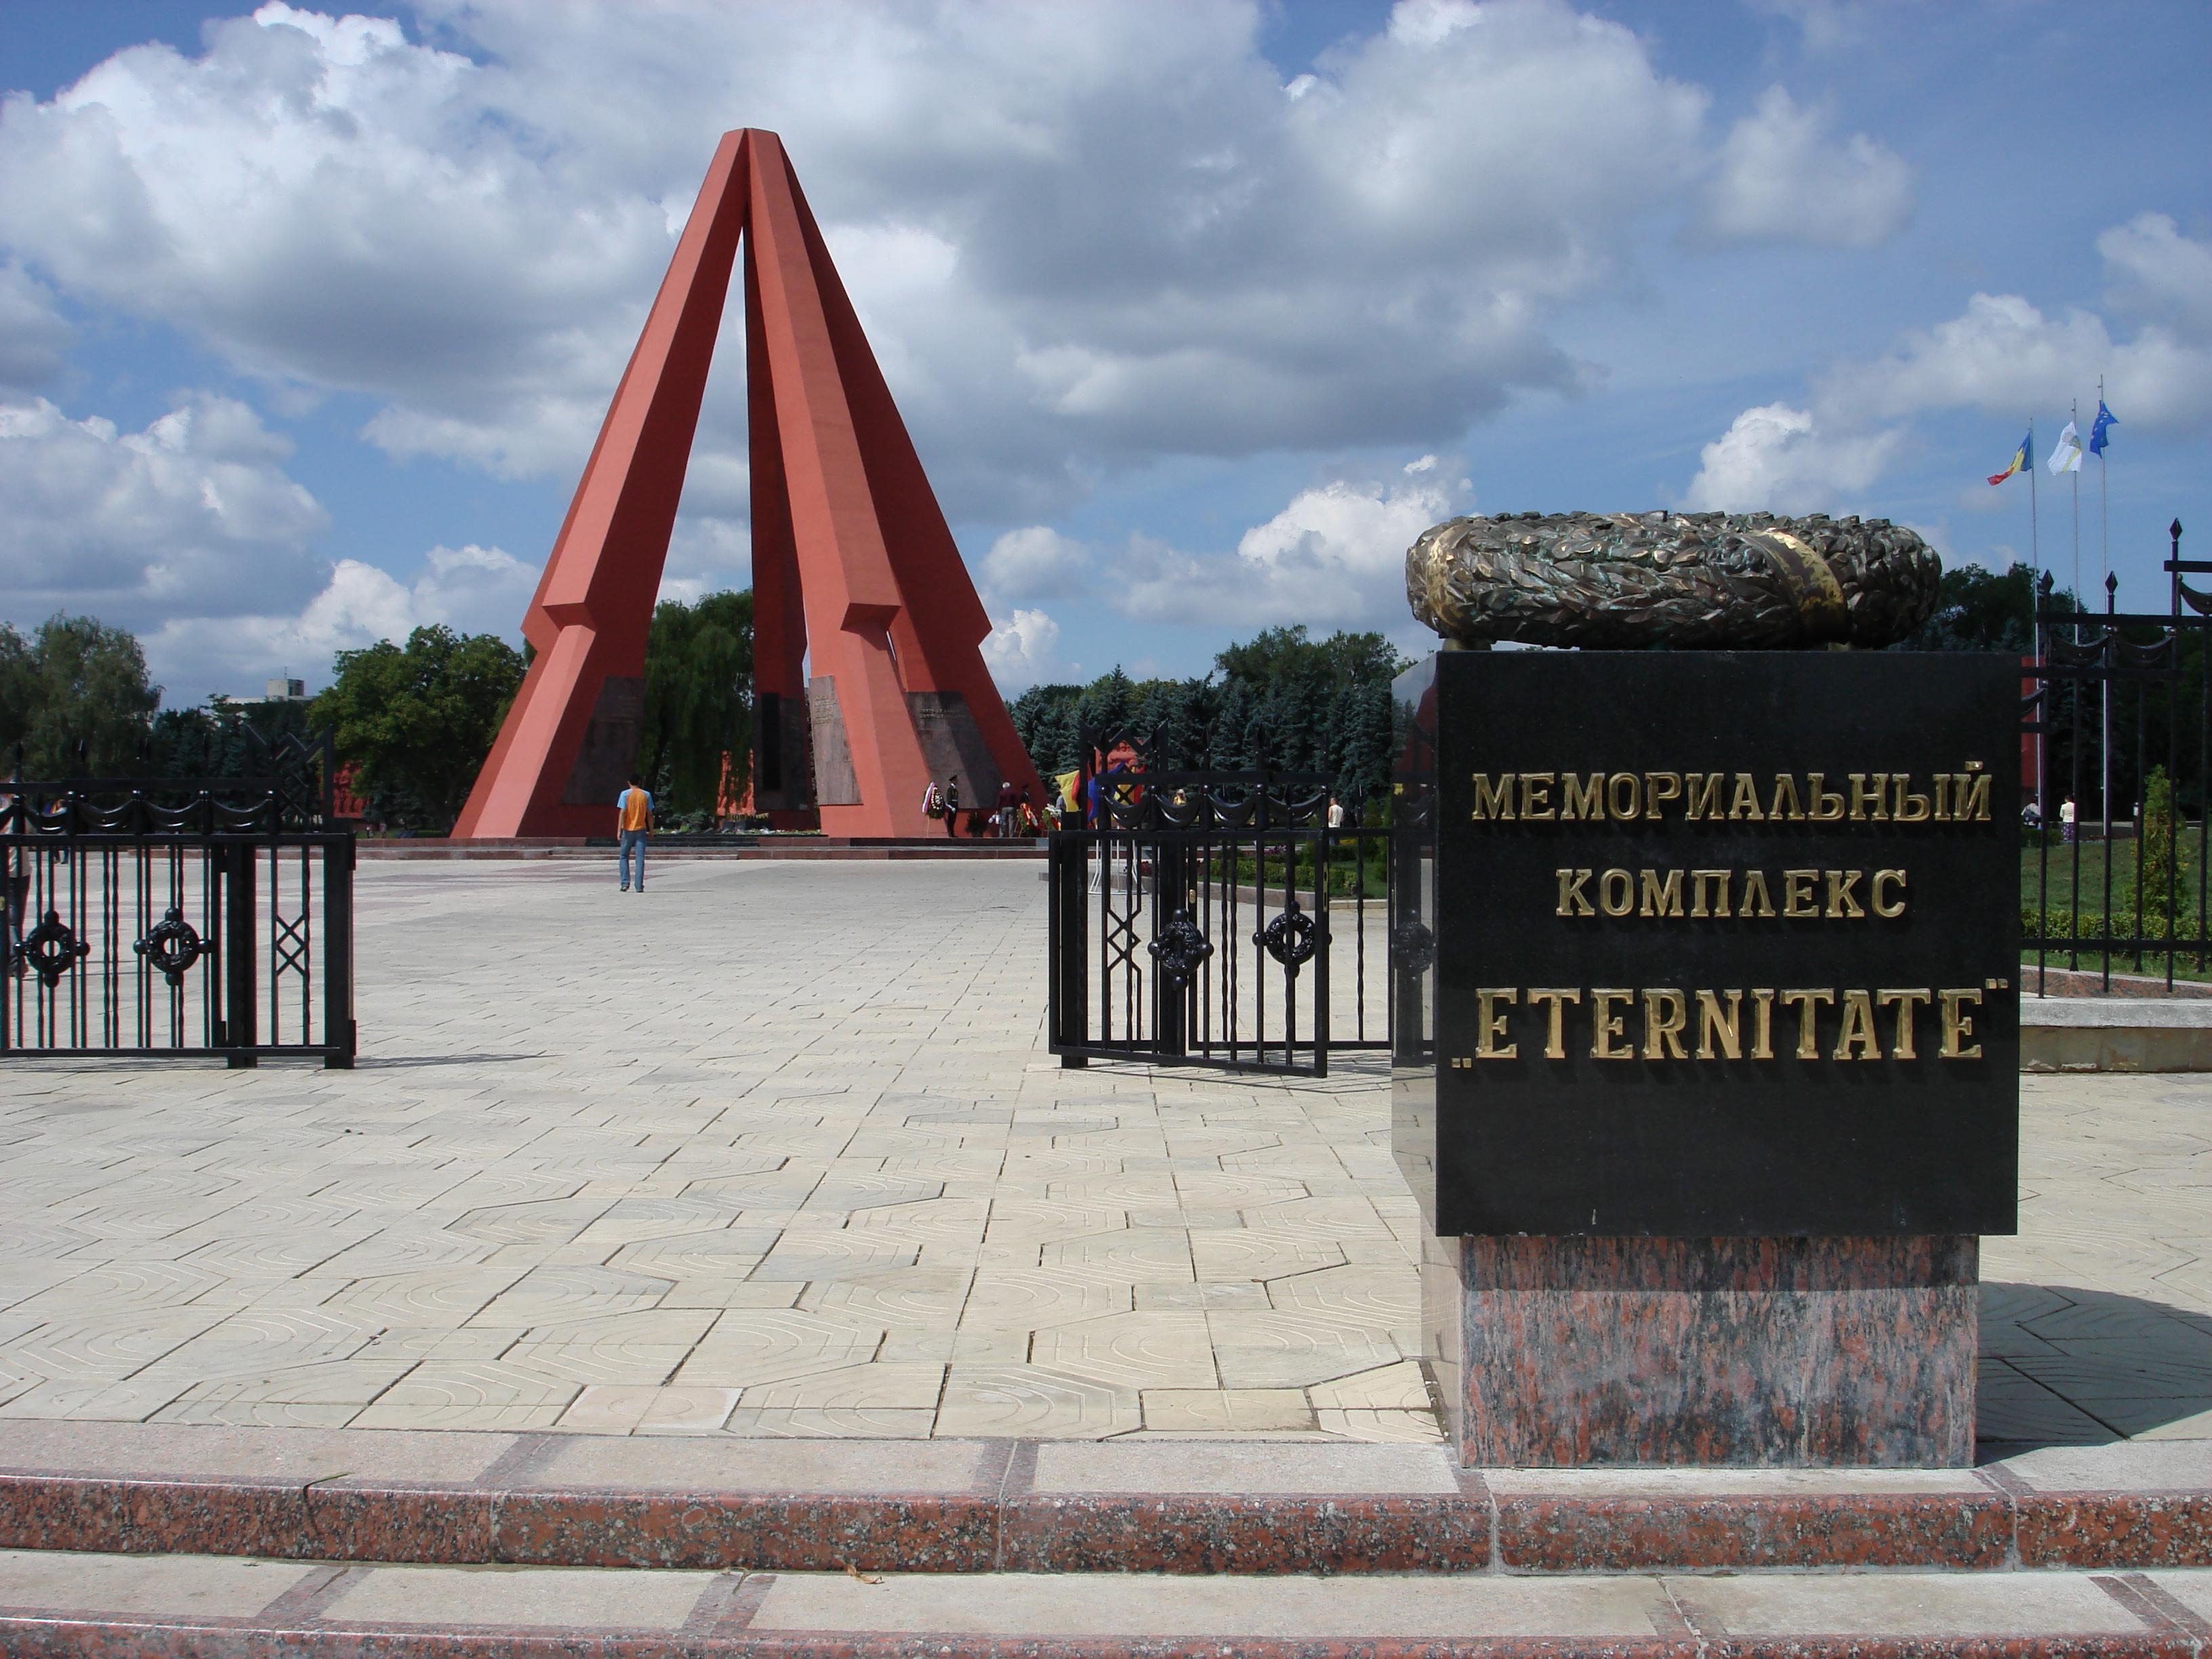 Эконом памятник Арка Пущино Ваза. Габбро-диабаз Стародуб